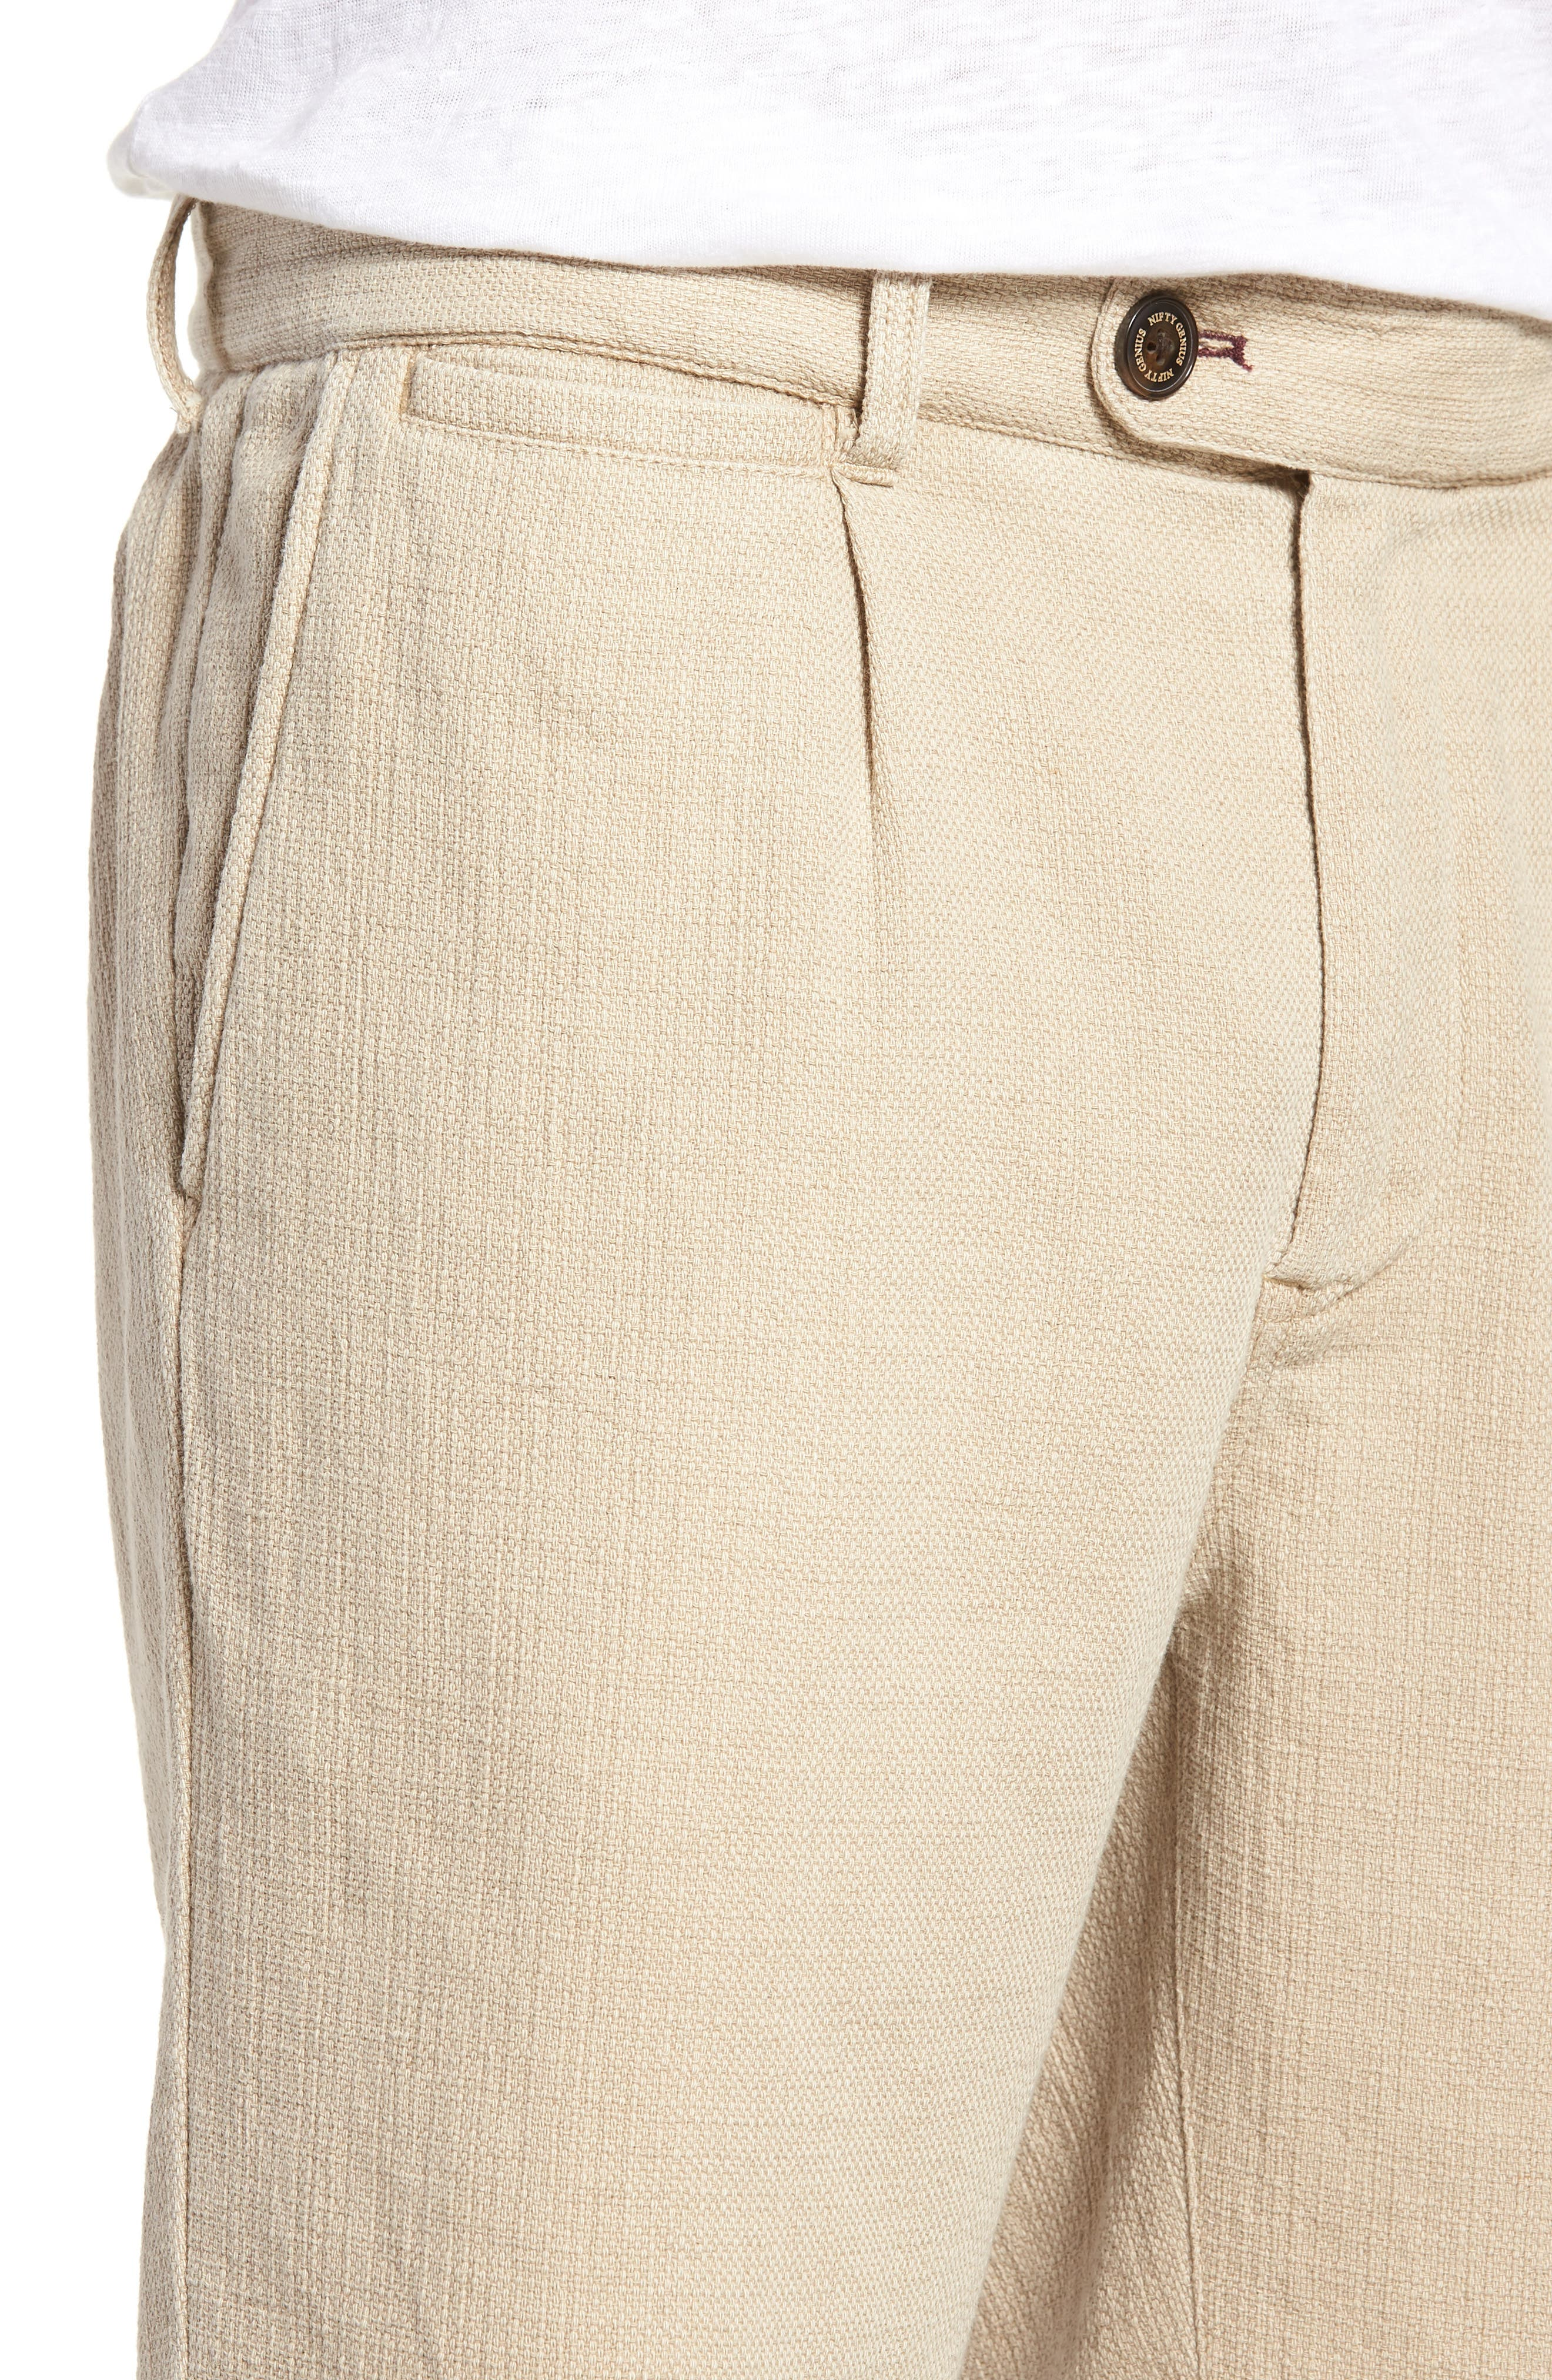 NIFTY GENIUS,                             Thomas Regular Fit Pleated Shorts,                             Alternate thumbnail 4, color,                             250